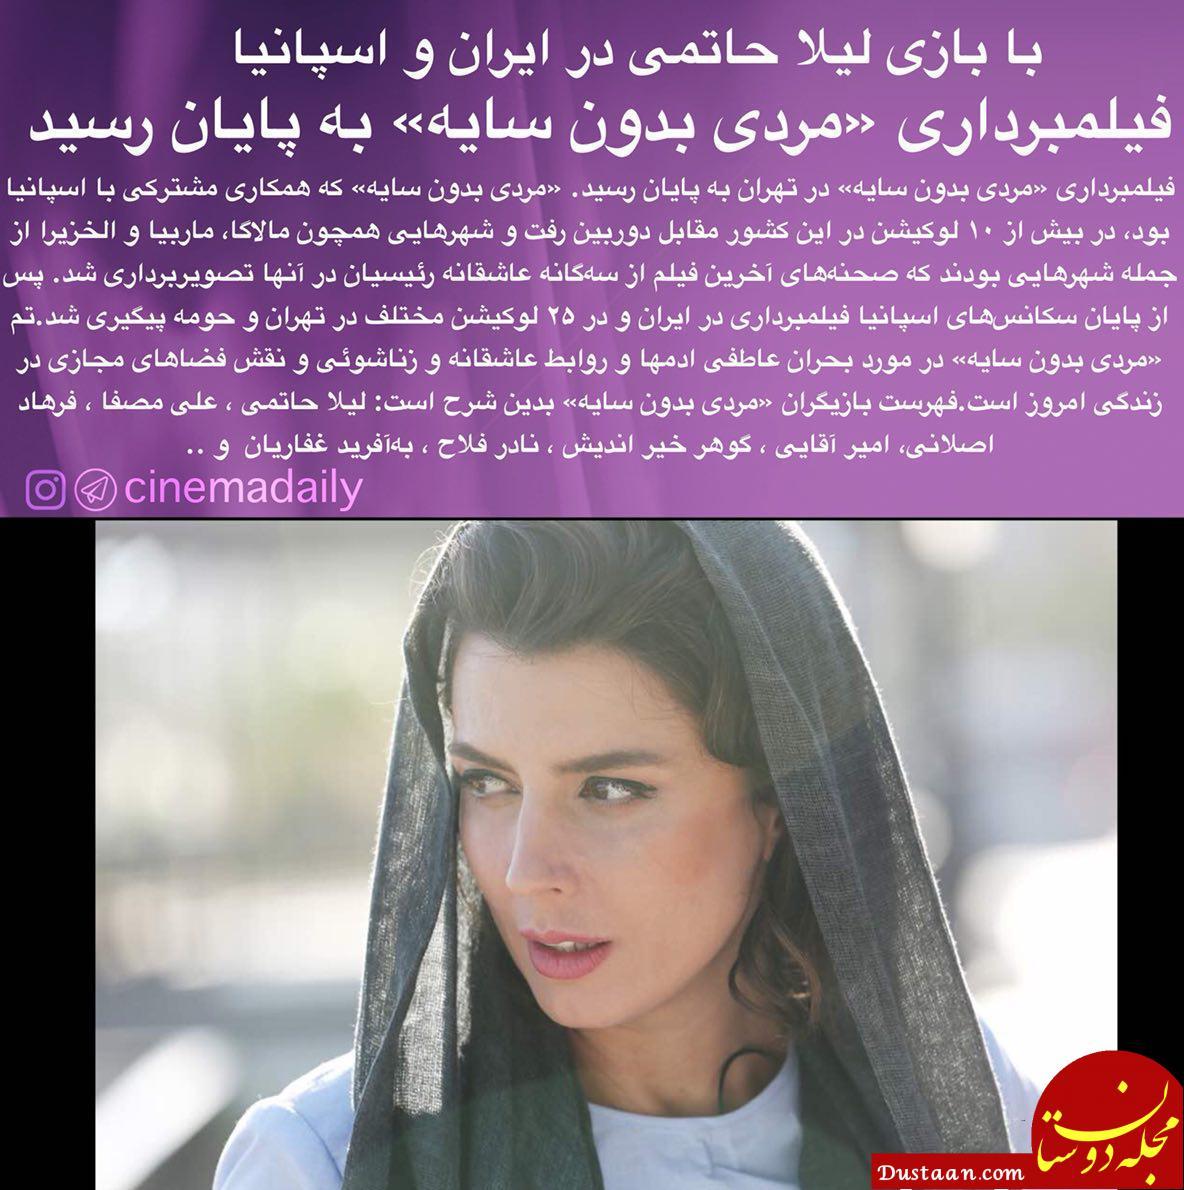 www.dustaan.com پایان فیلمیرداری «مردی بدون سایه» در ایران و اسپانیا